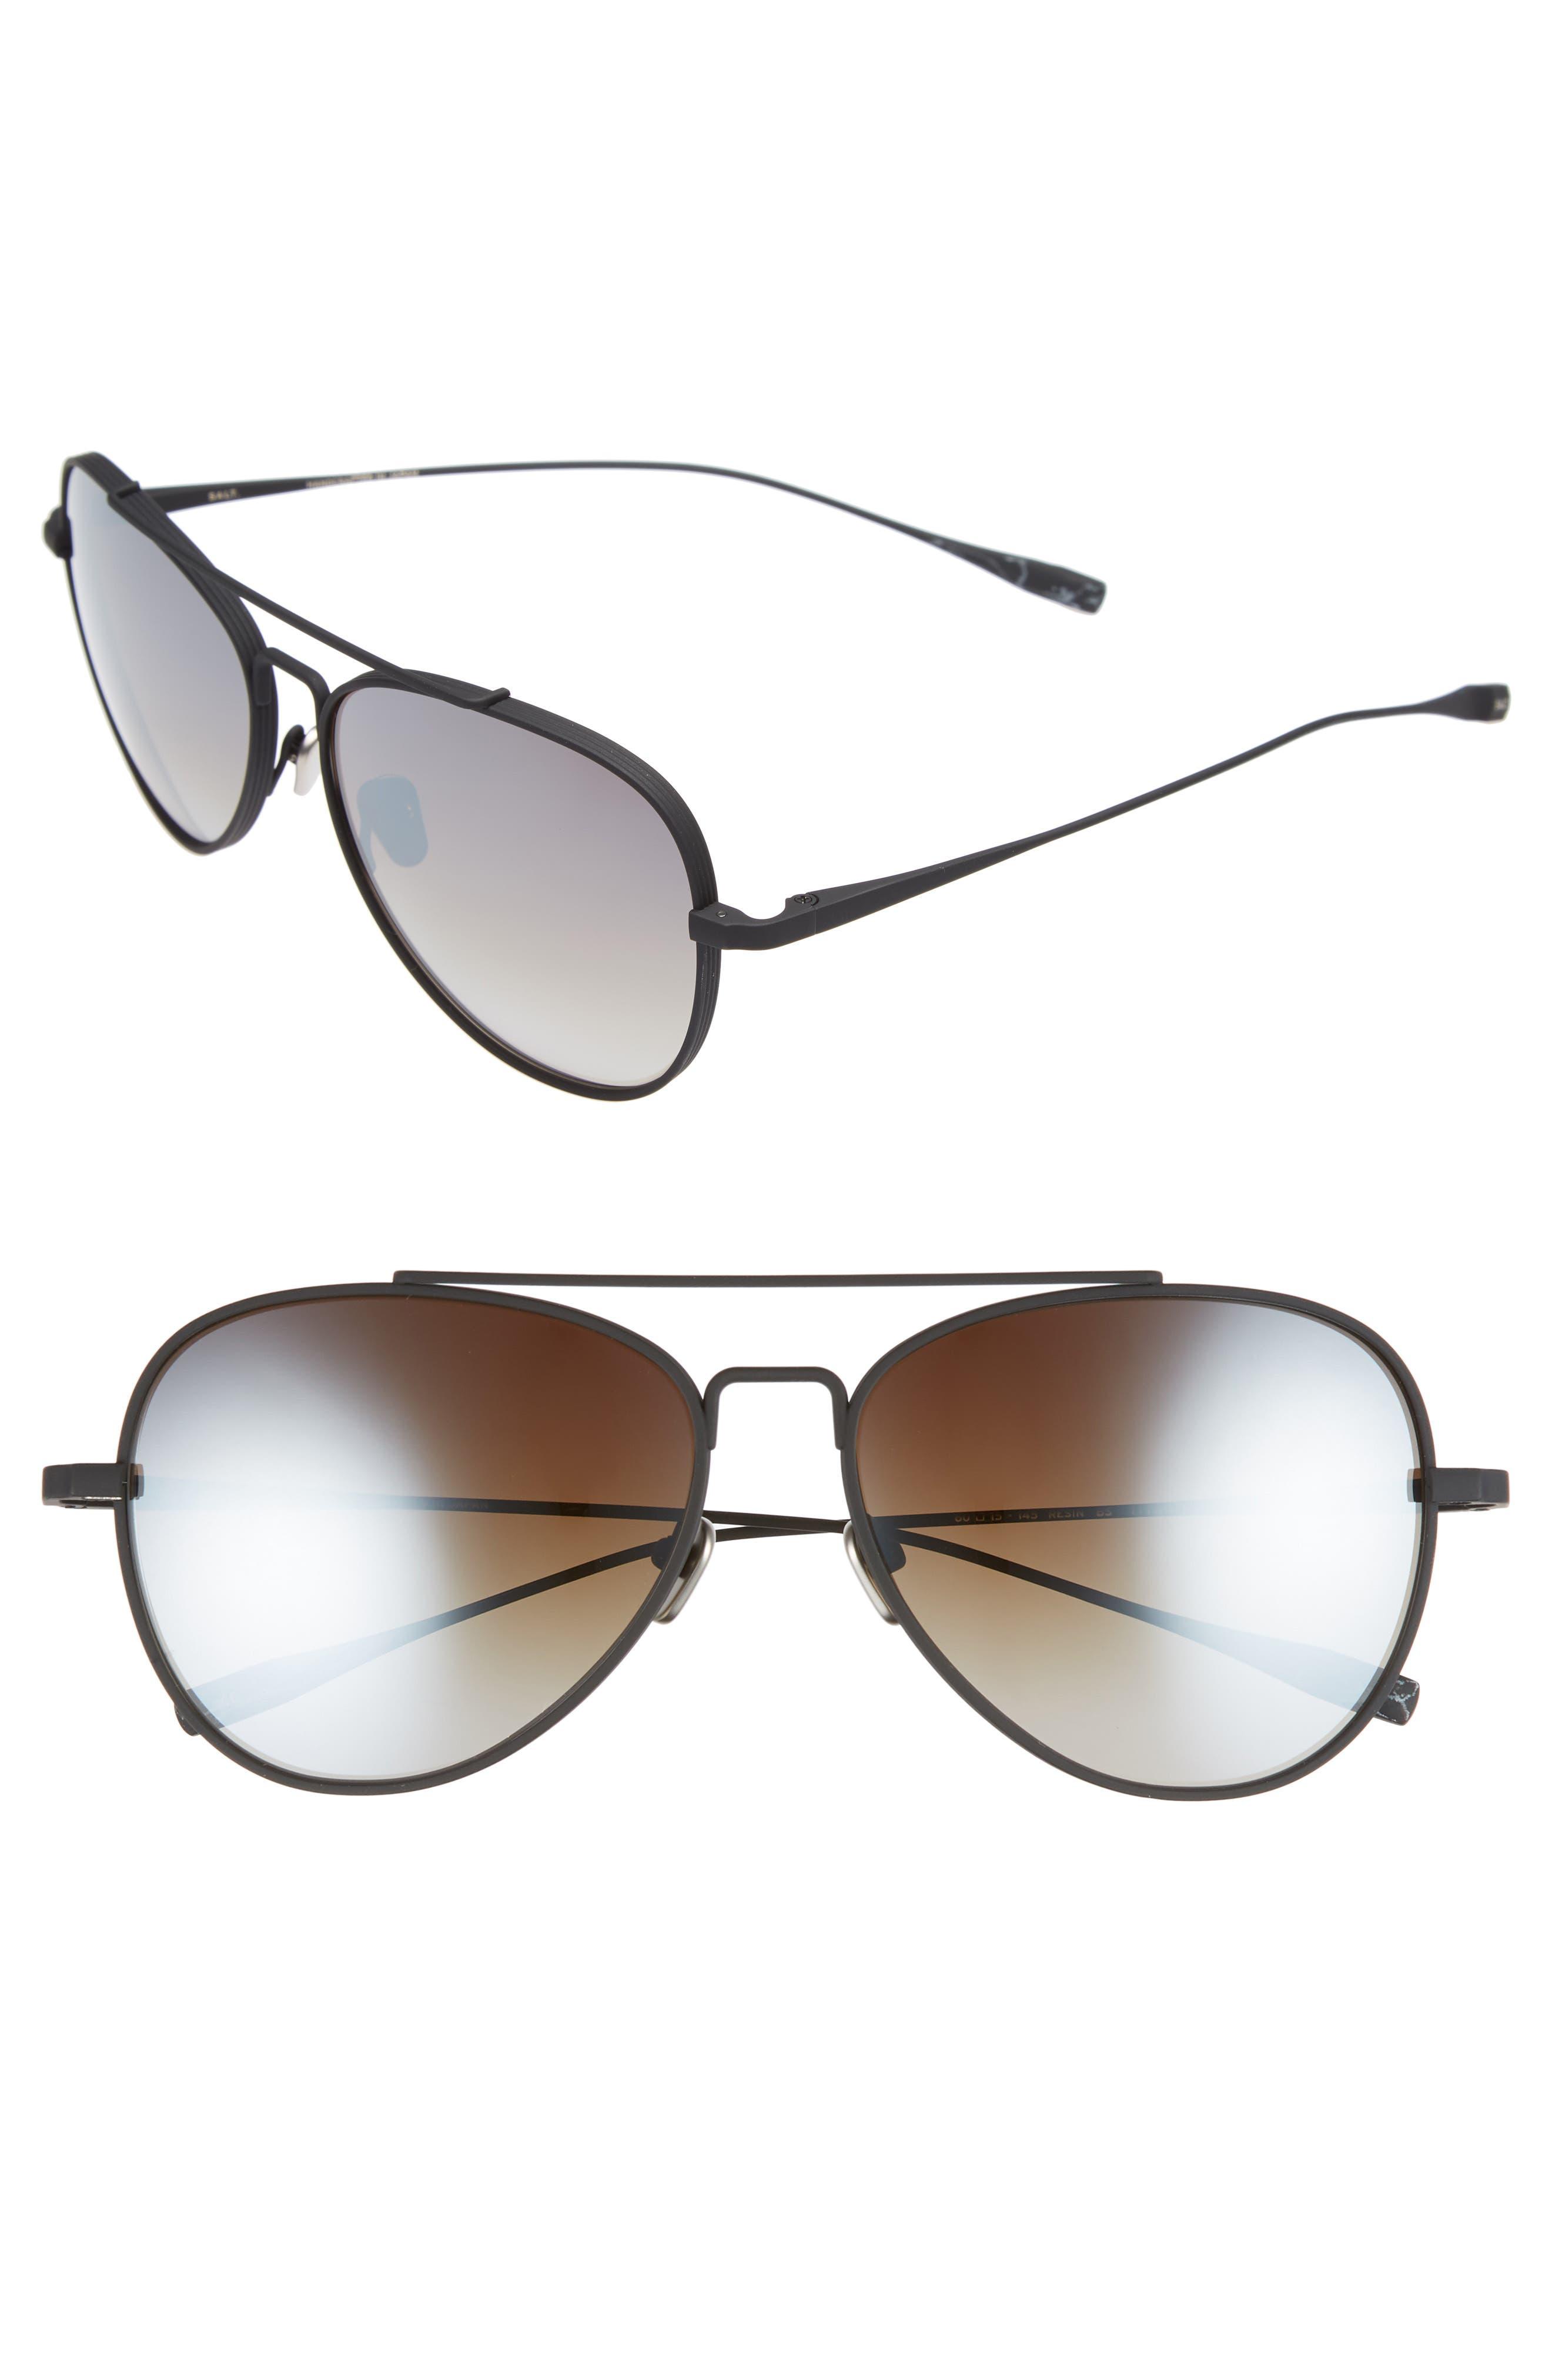 60mm Polarized Aviator Sunglasses,                             Main thumbnail 1, color,                             BLACK